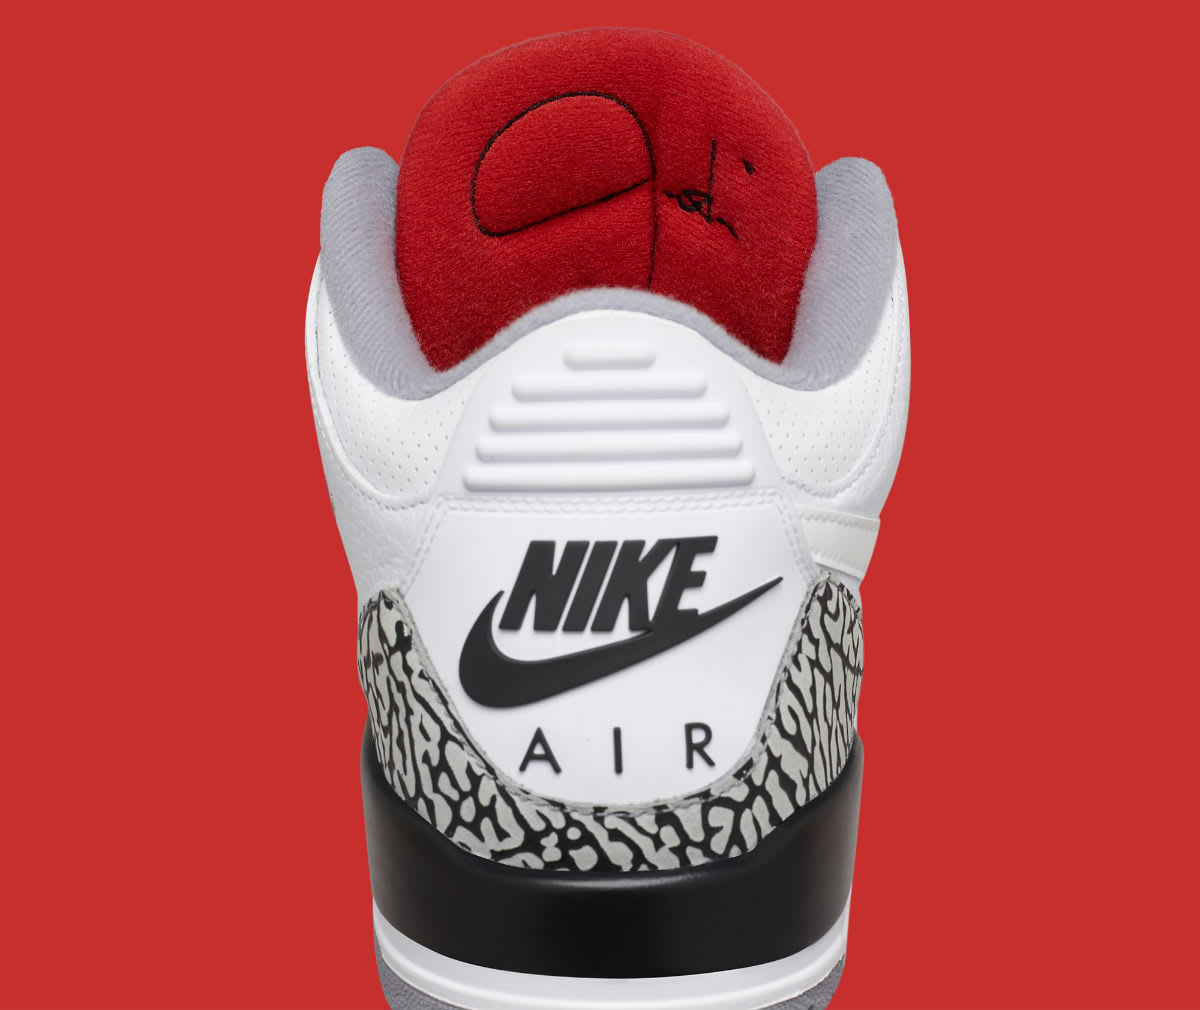 Air Jordan 3 III JTH Timberlake Hatfield Super Bowl Release Date AV6683-160 Tongue